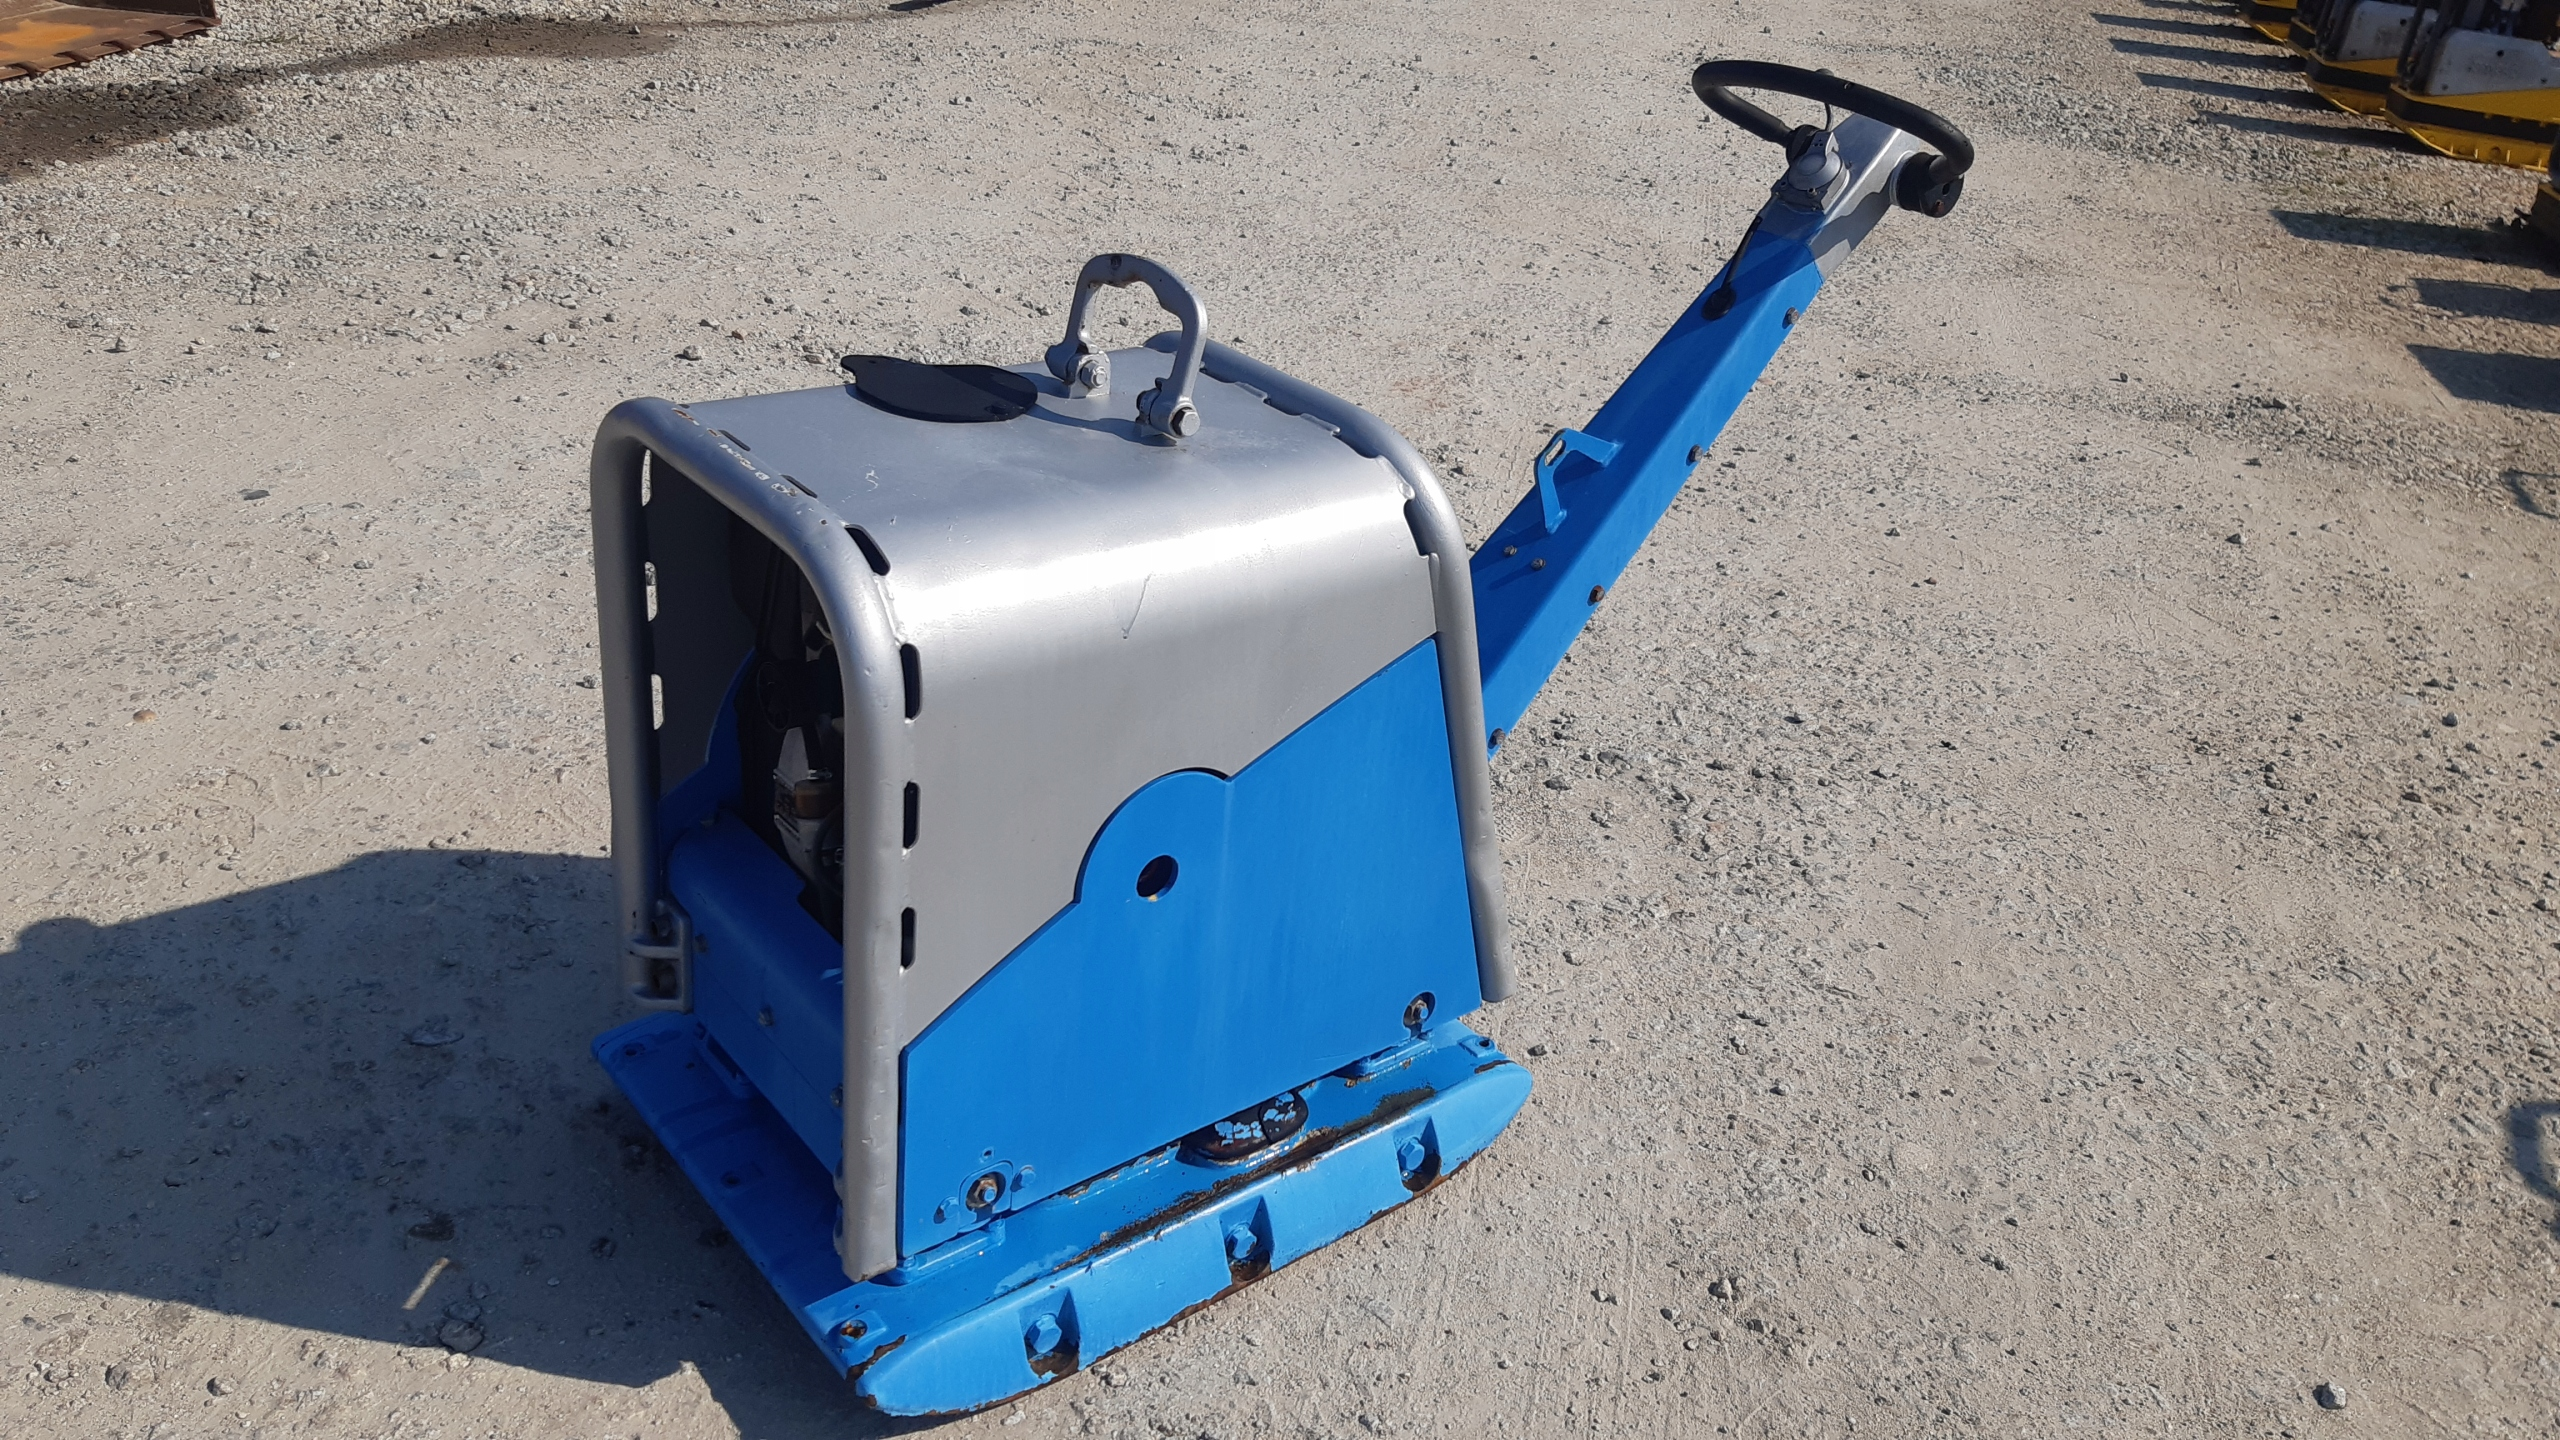 Компактор WEBER CR 8 590 кг! 07р! | Wacker Dpu |